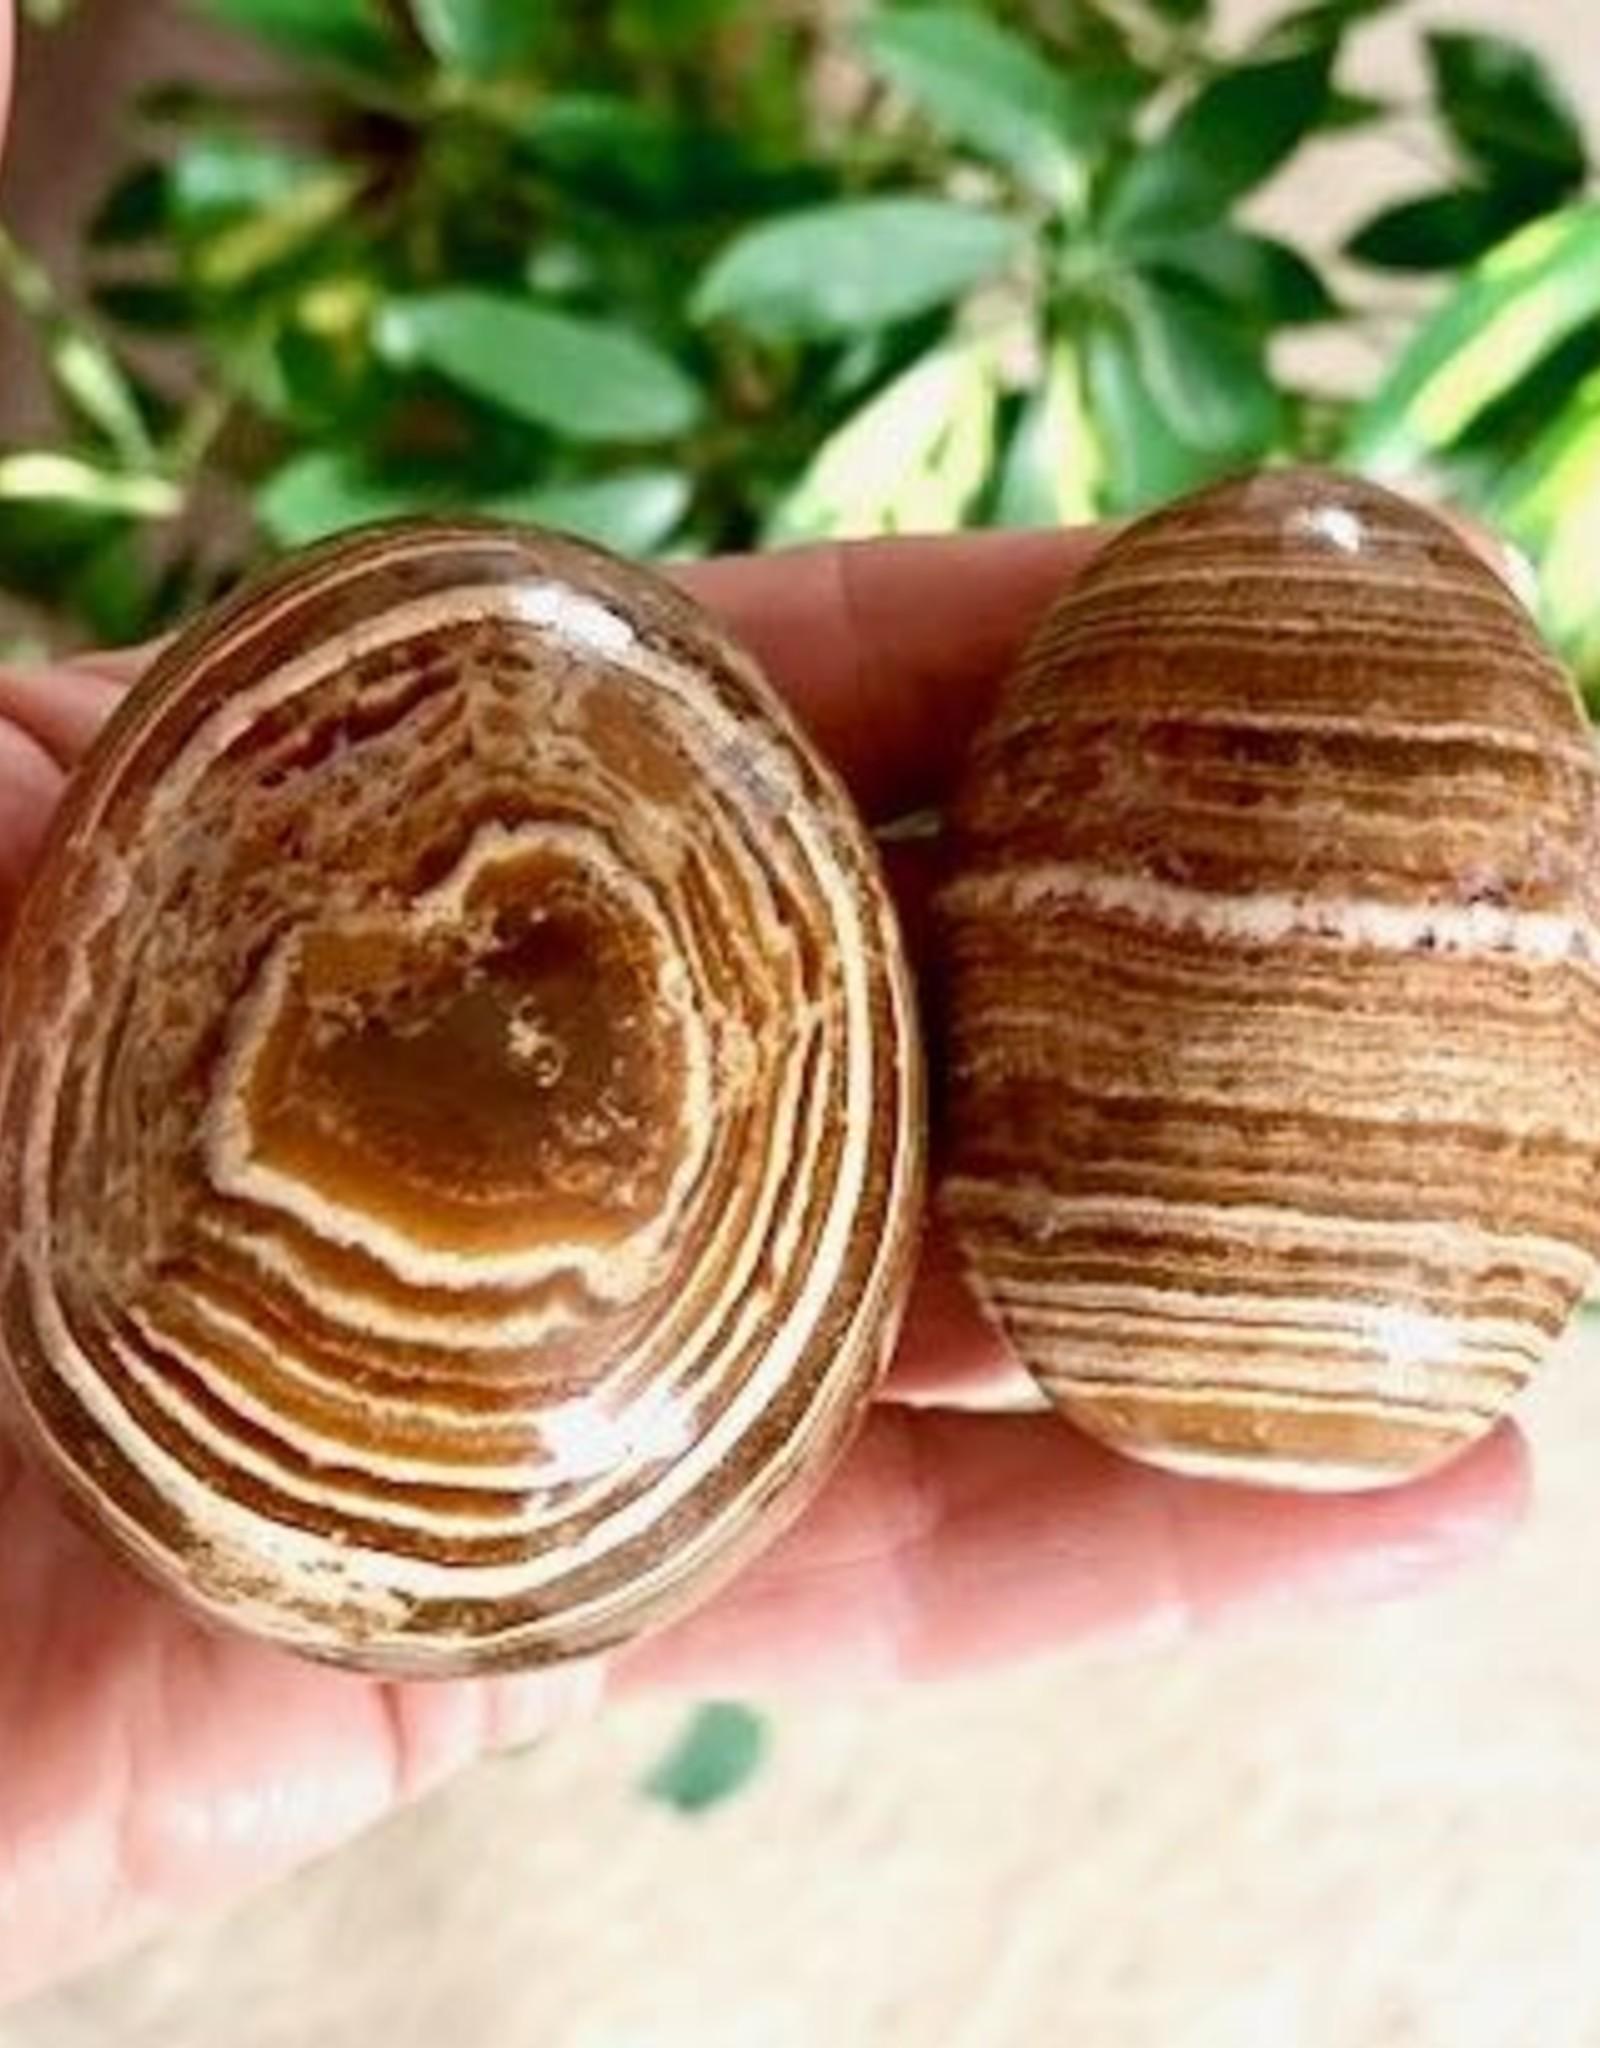 Aragonite Eggs for gentle release